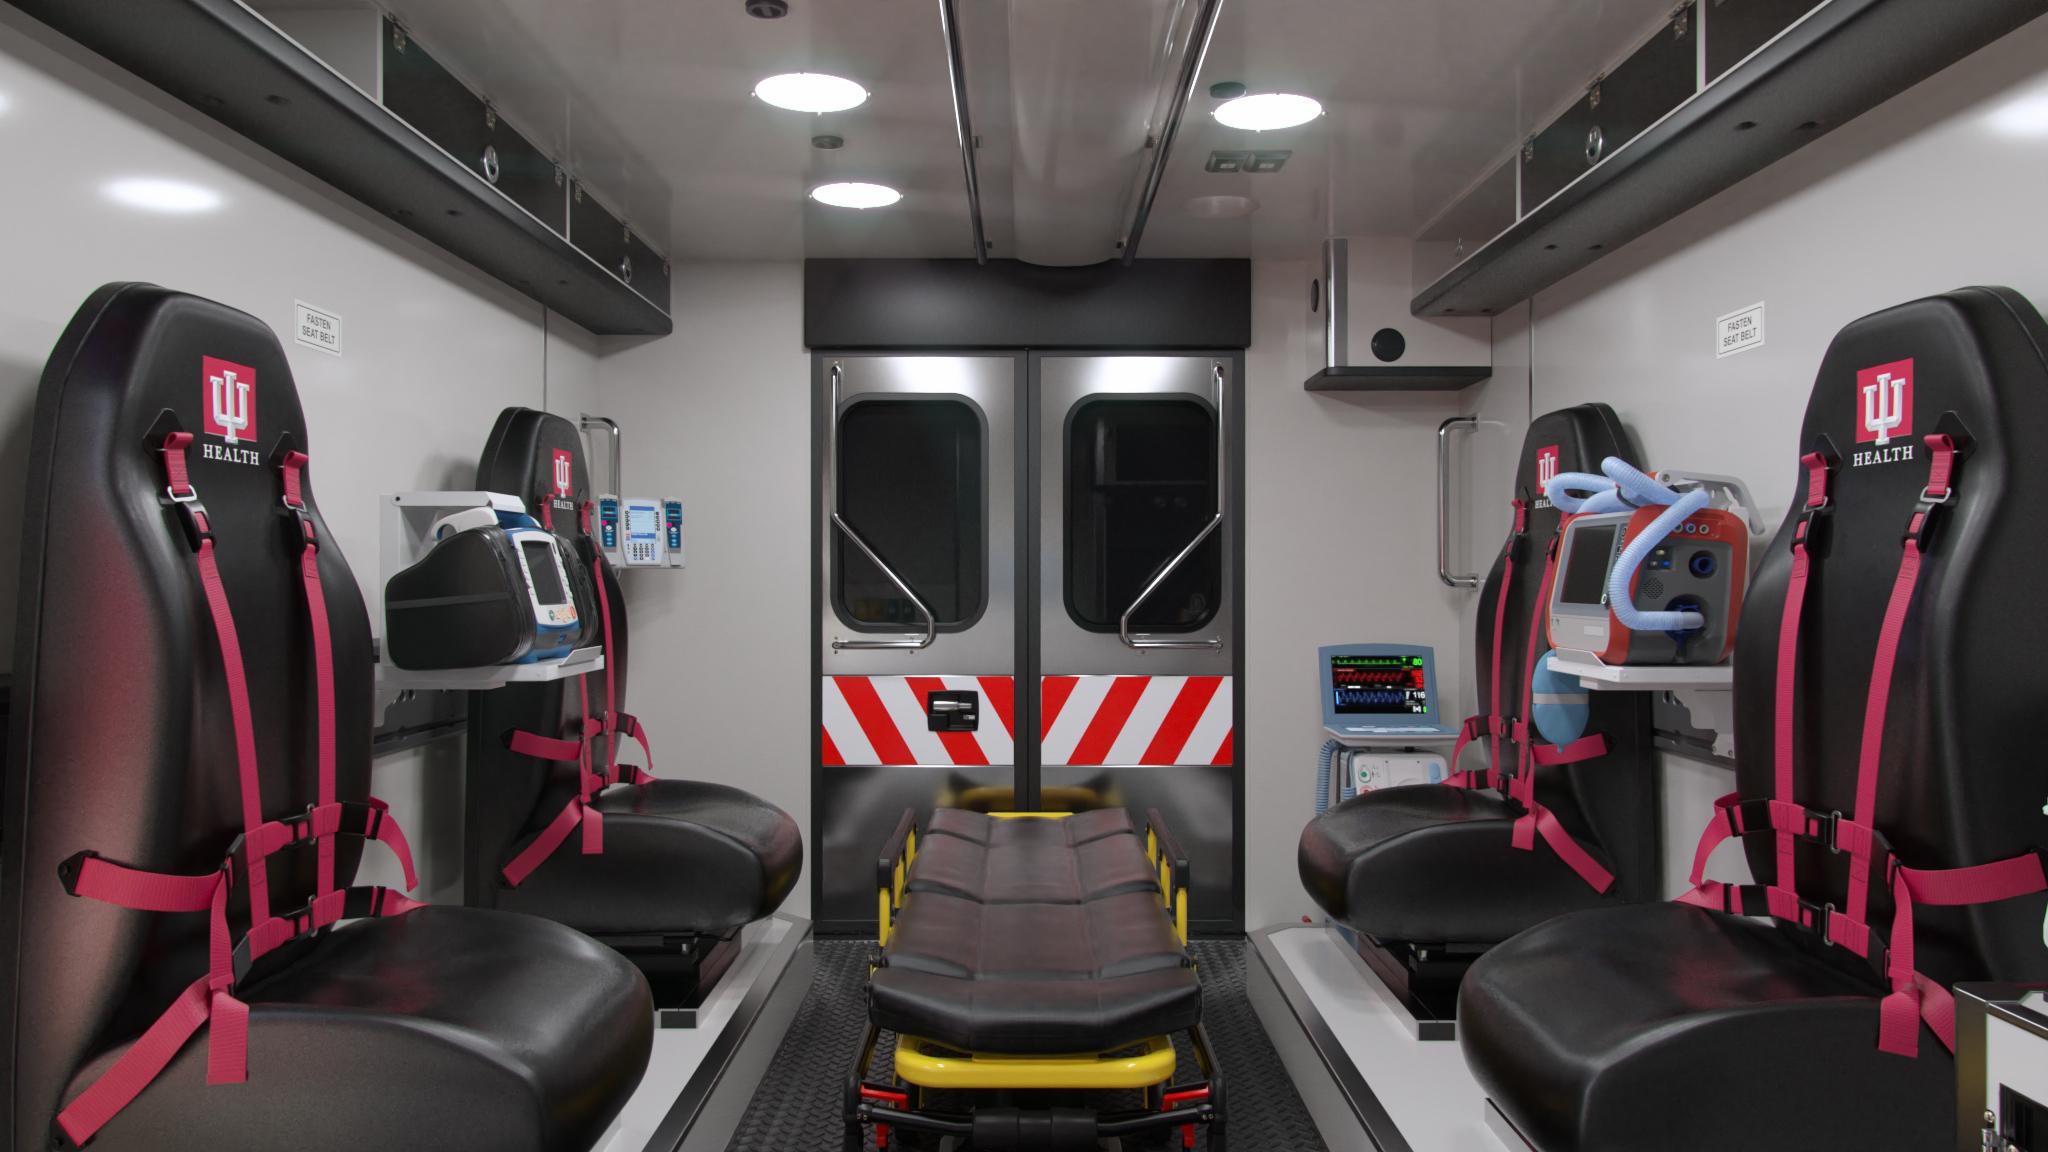 IU Health LifeLine Ambulance